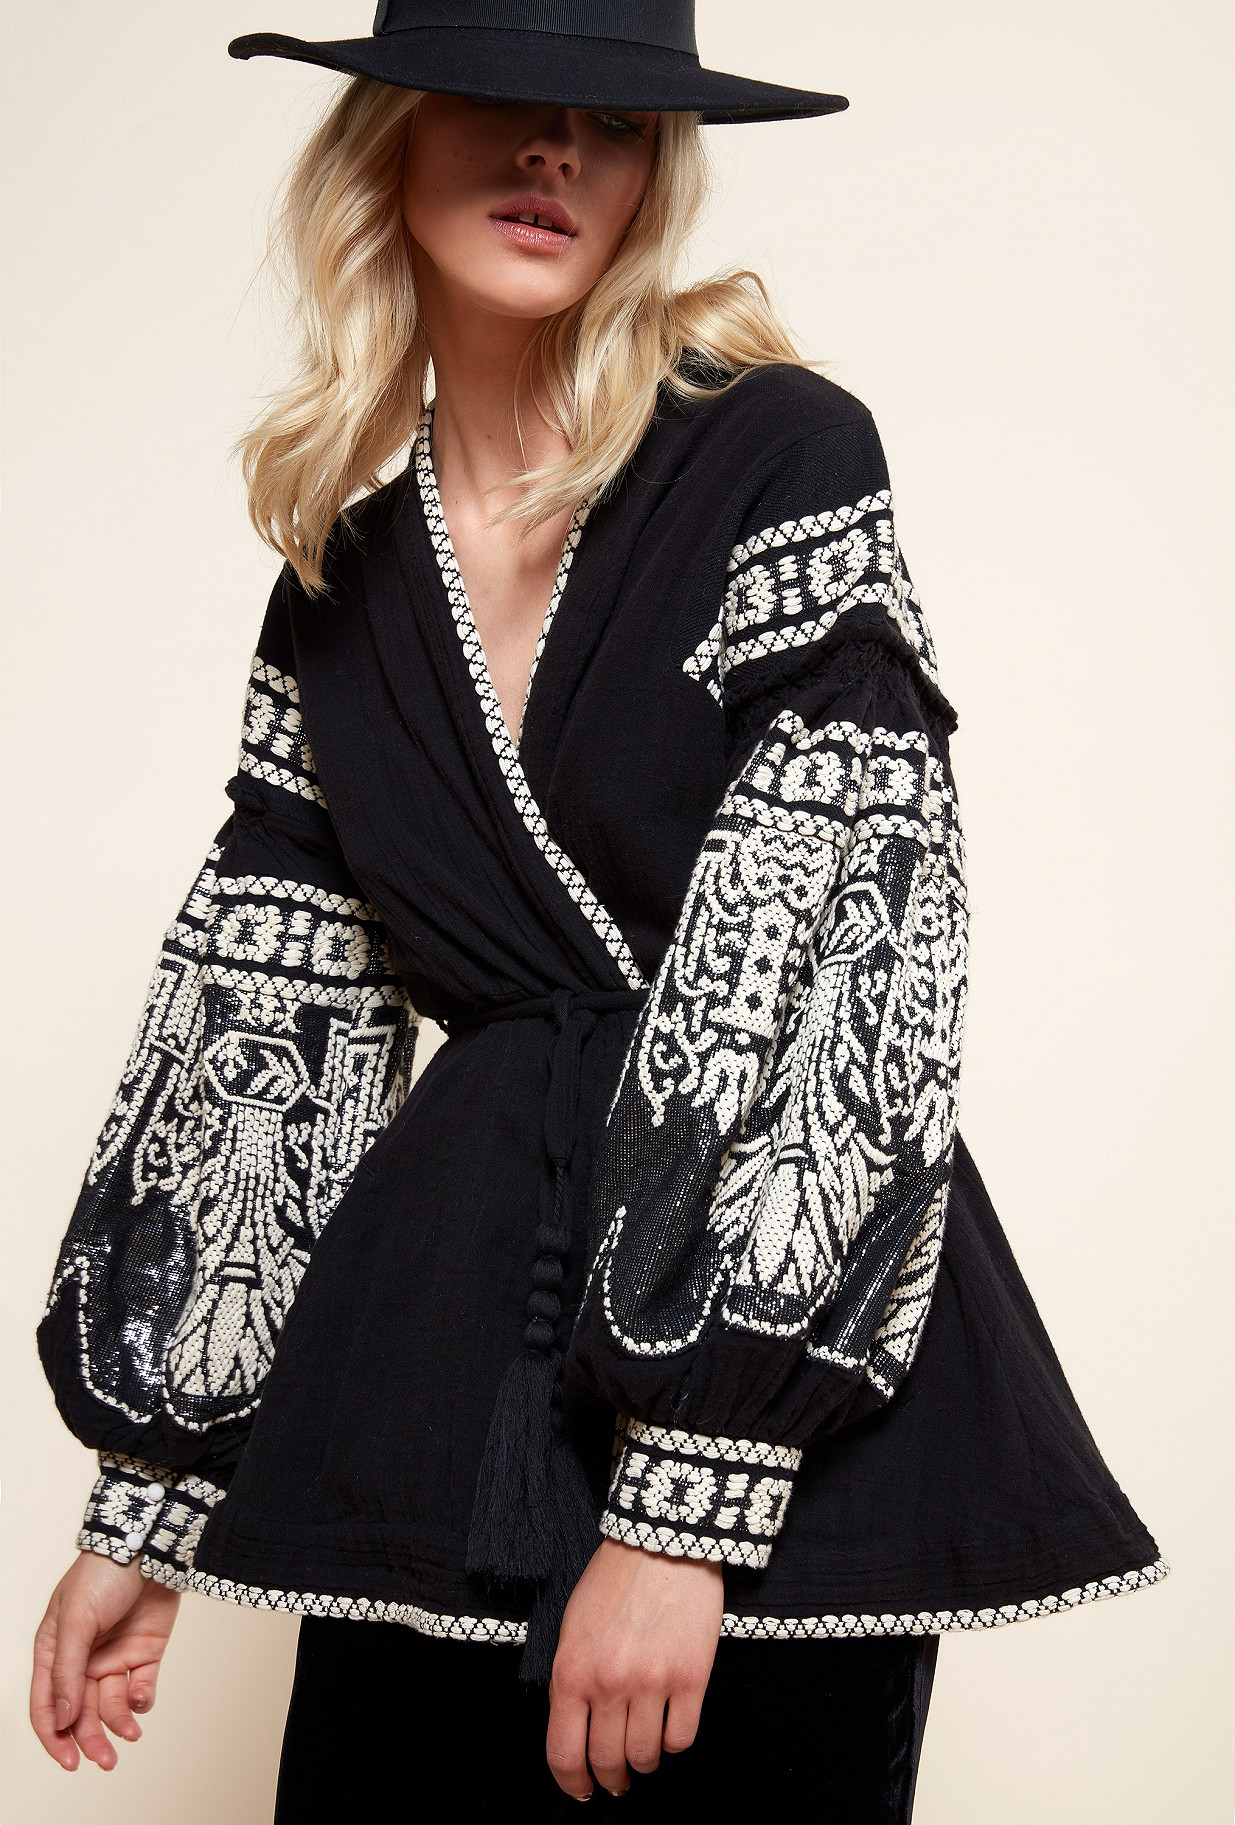 Black  JACKET  Petrushka Mes demoiselles fashion clothes designer Paris